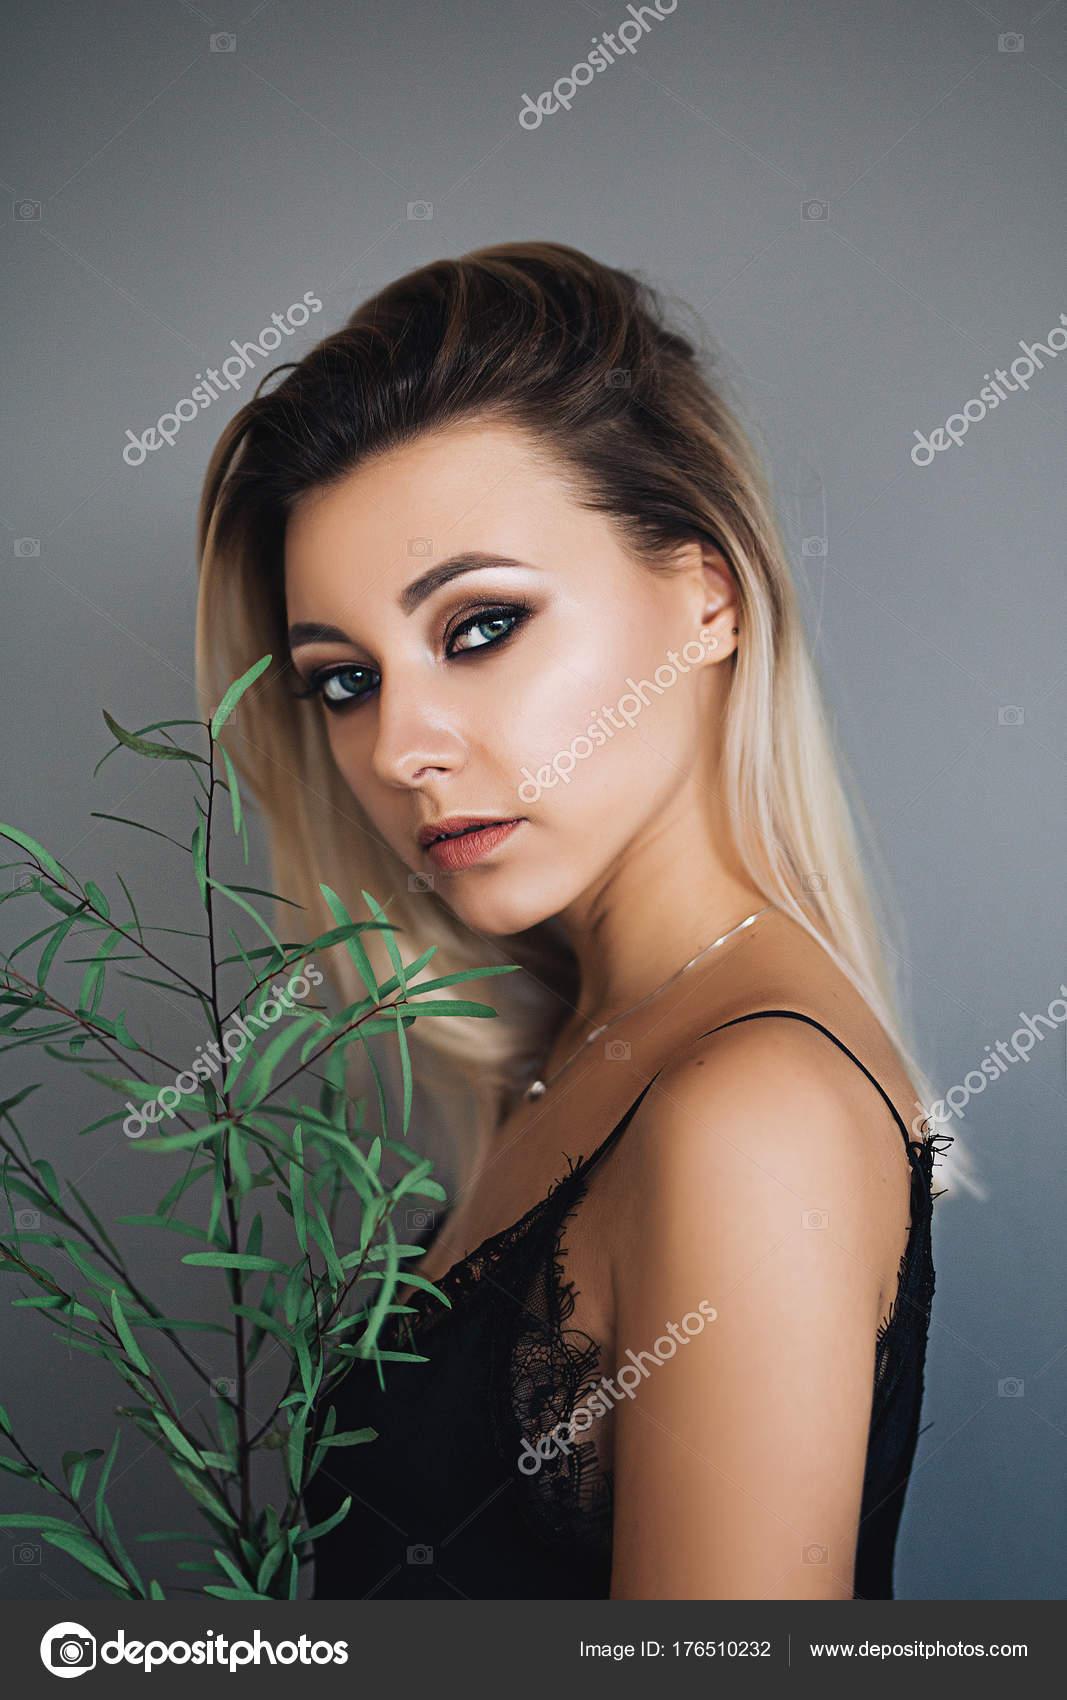 Красивые девушки дома 4